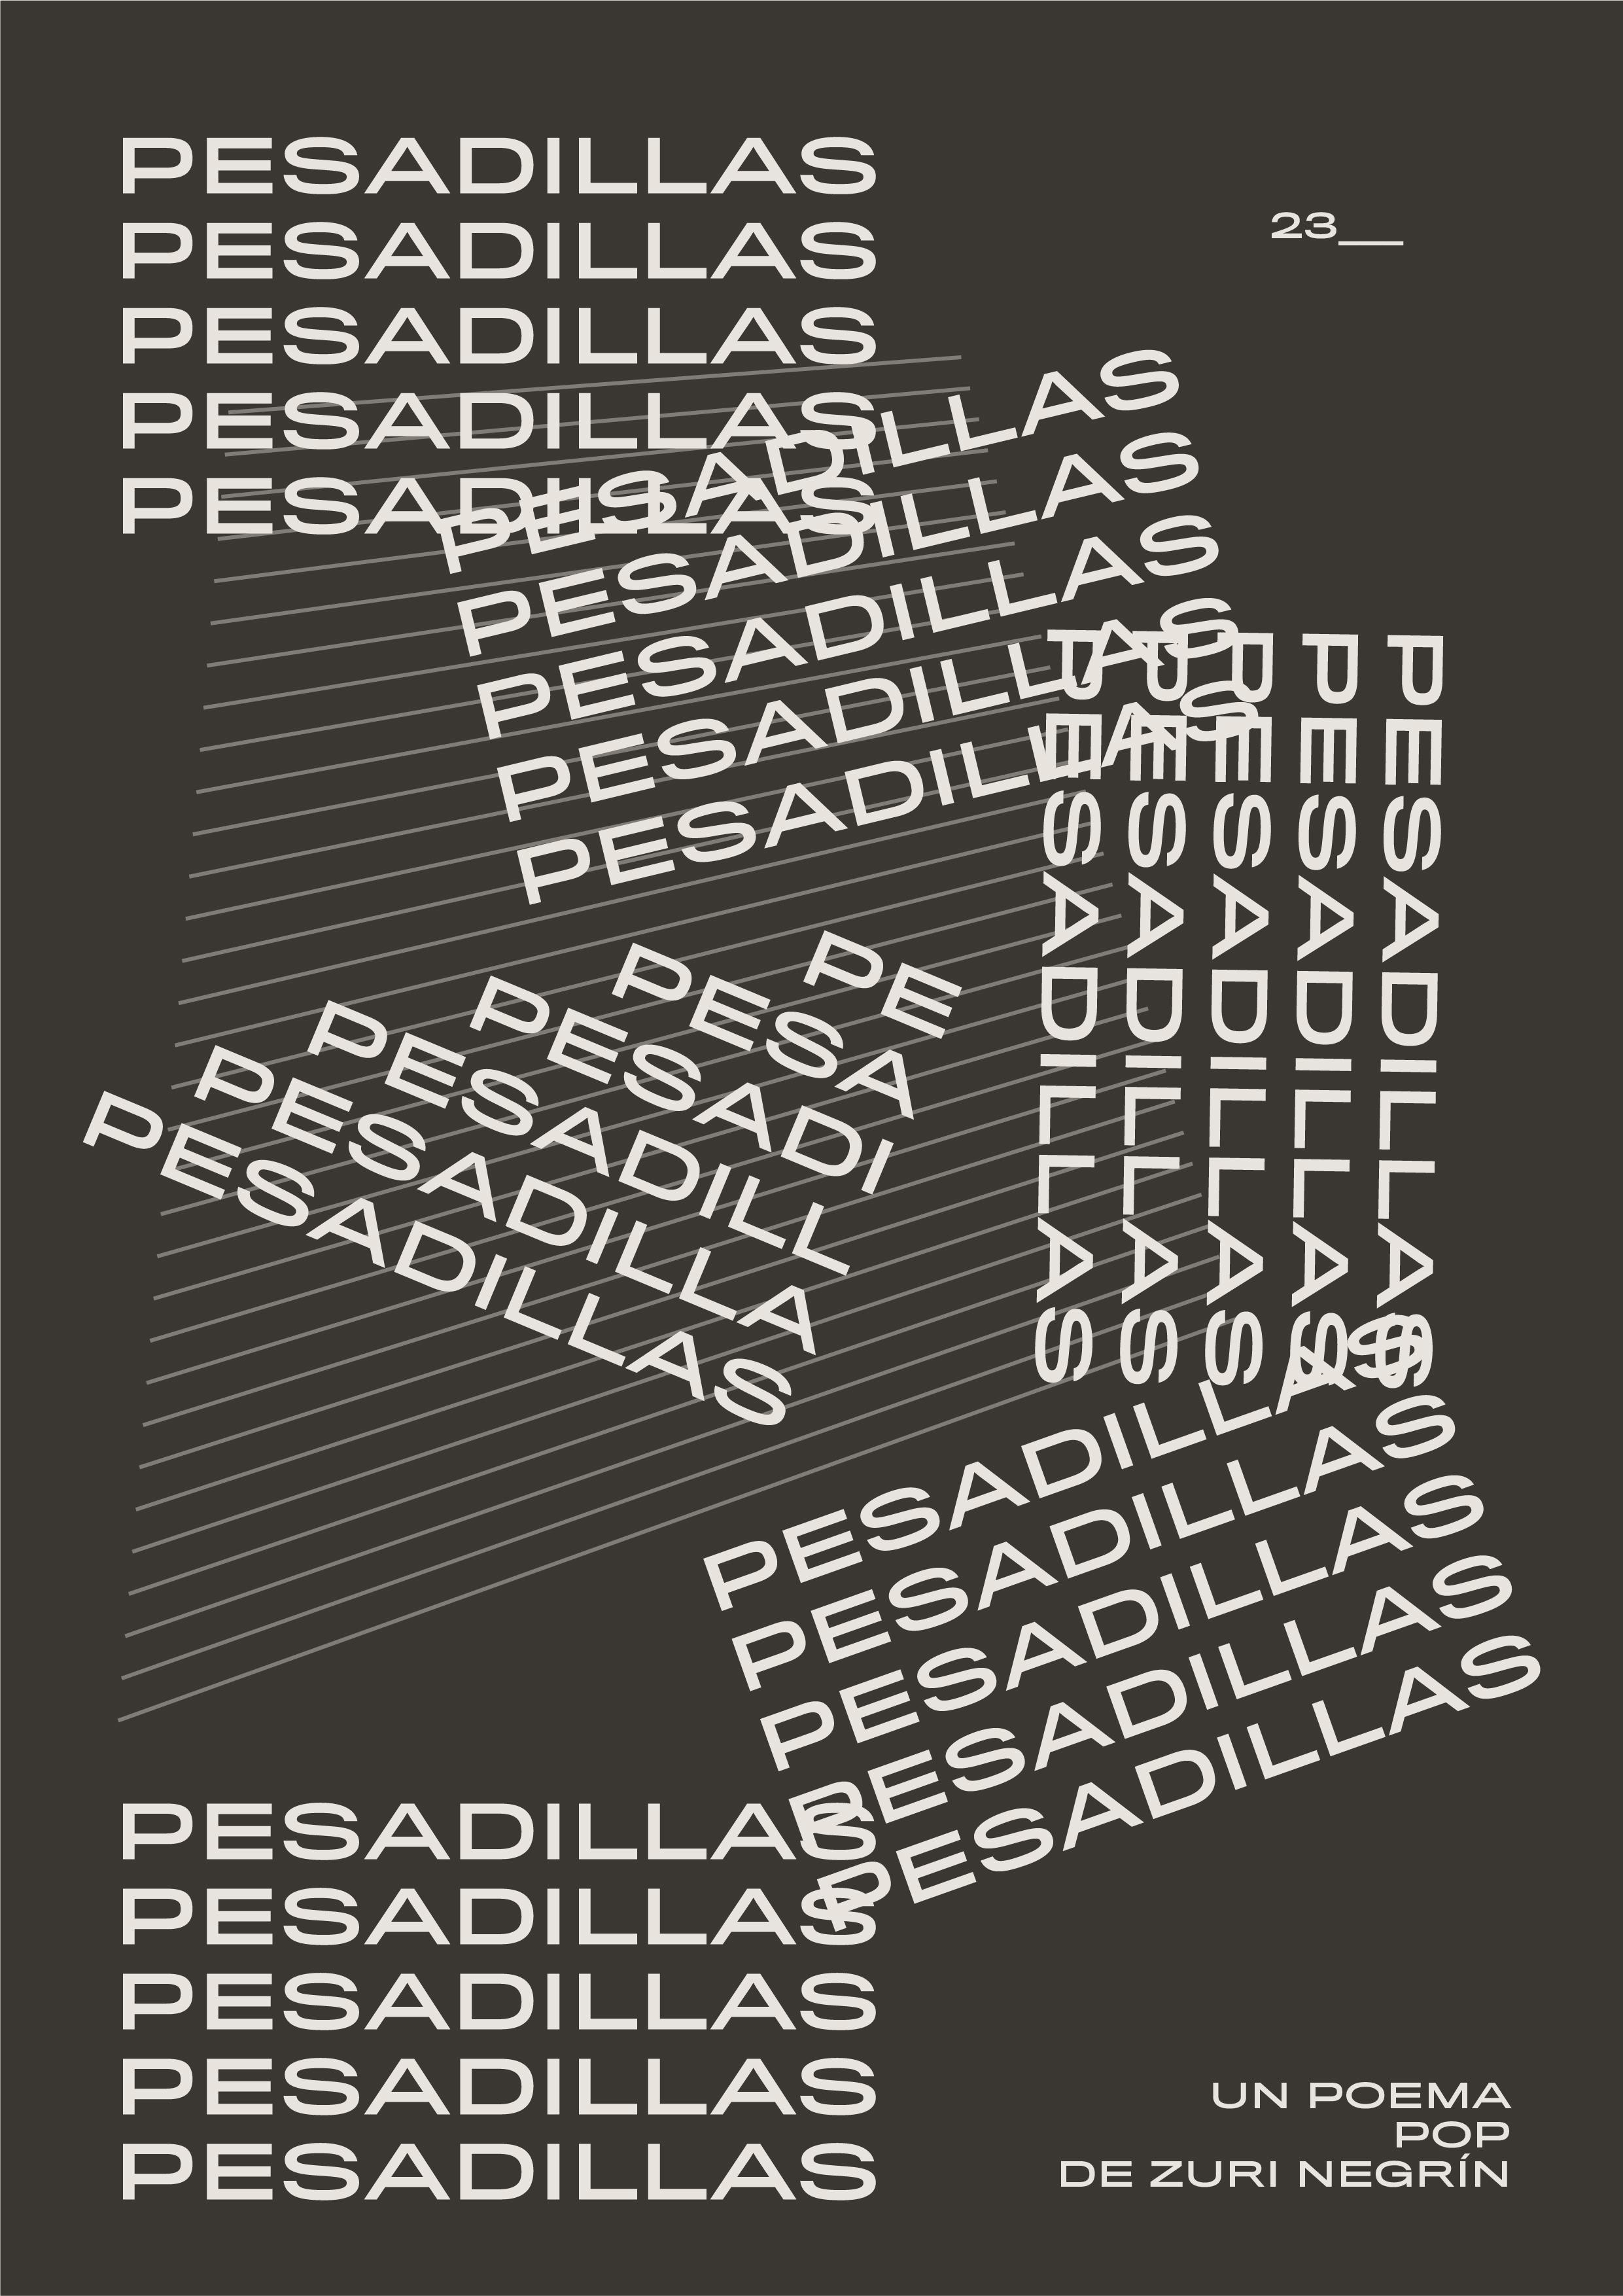 POP_23 Pesadillas